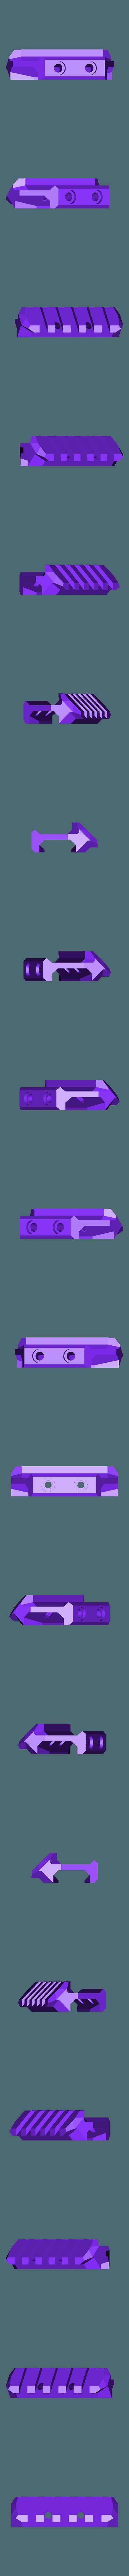 45_rail.stl Download STL file 3DTAC - 45° Rail • 3D printable model, 3DMX